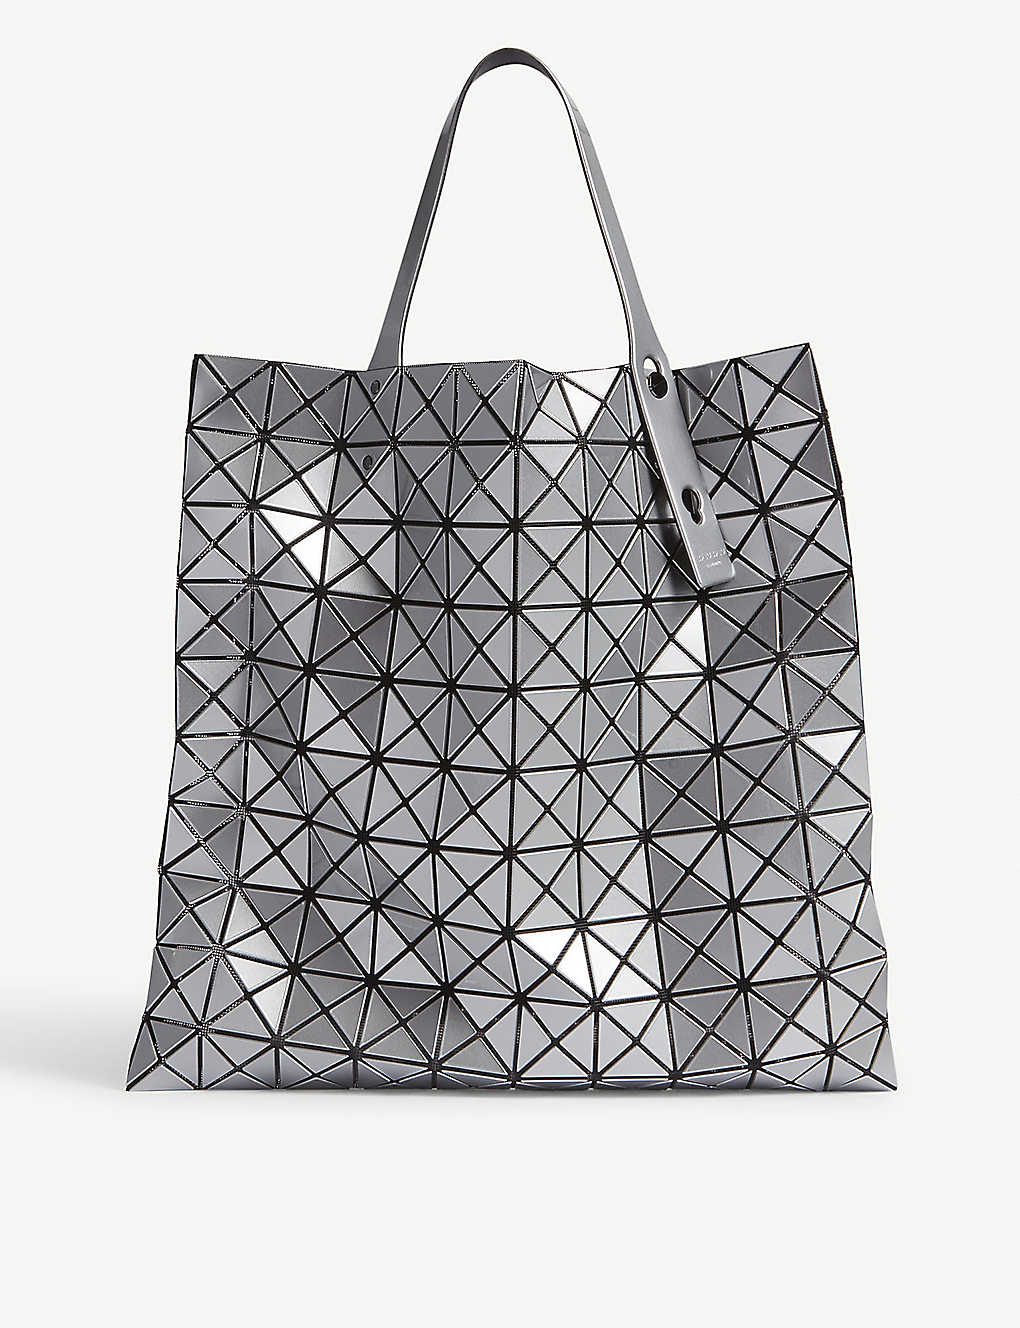 4c86a74f32 BAO BAO ISSEY MIYAKE - Prism metallic tote bag